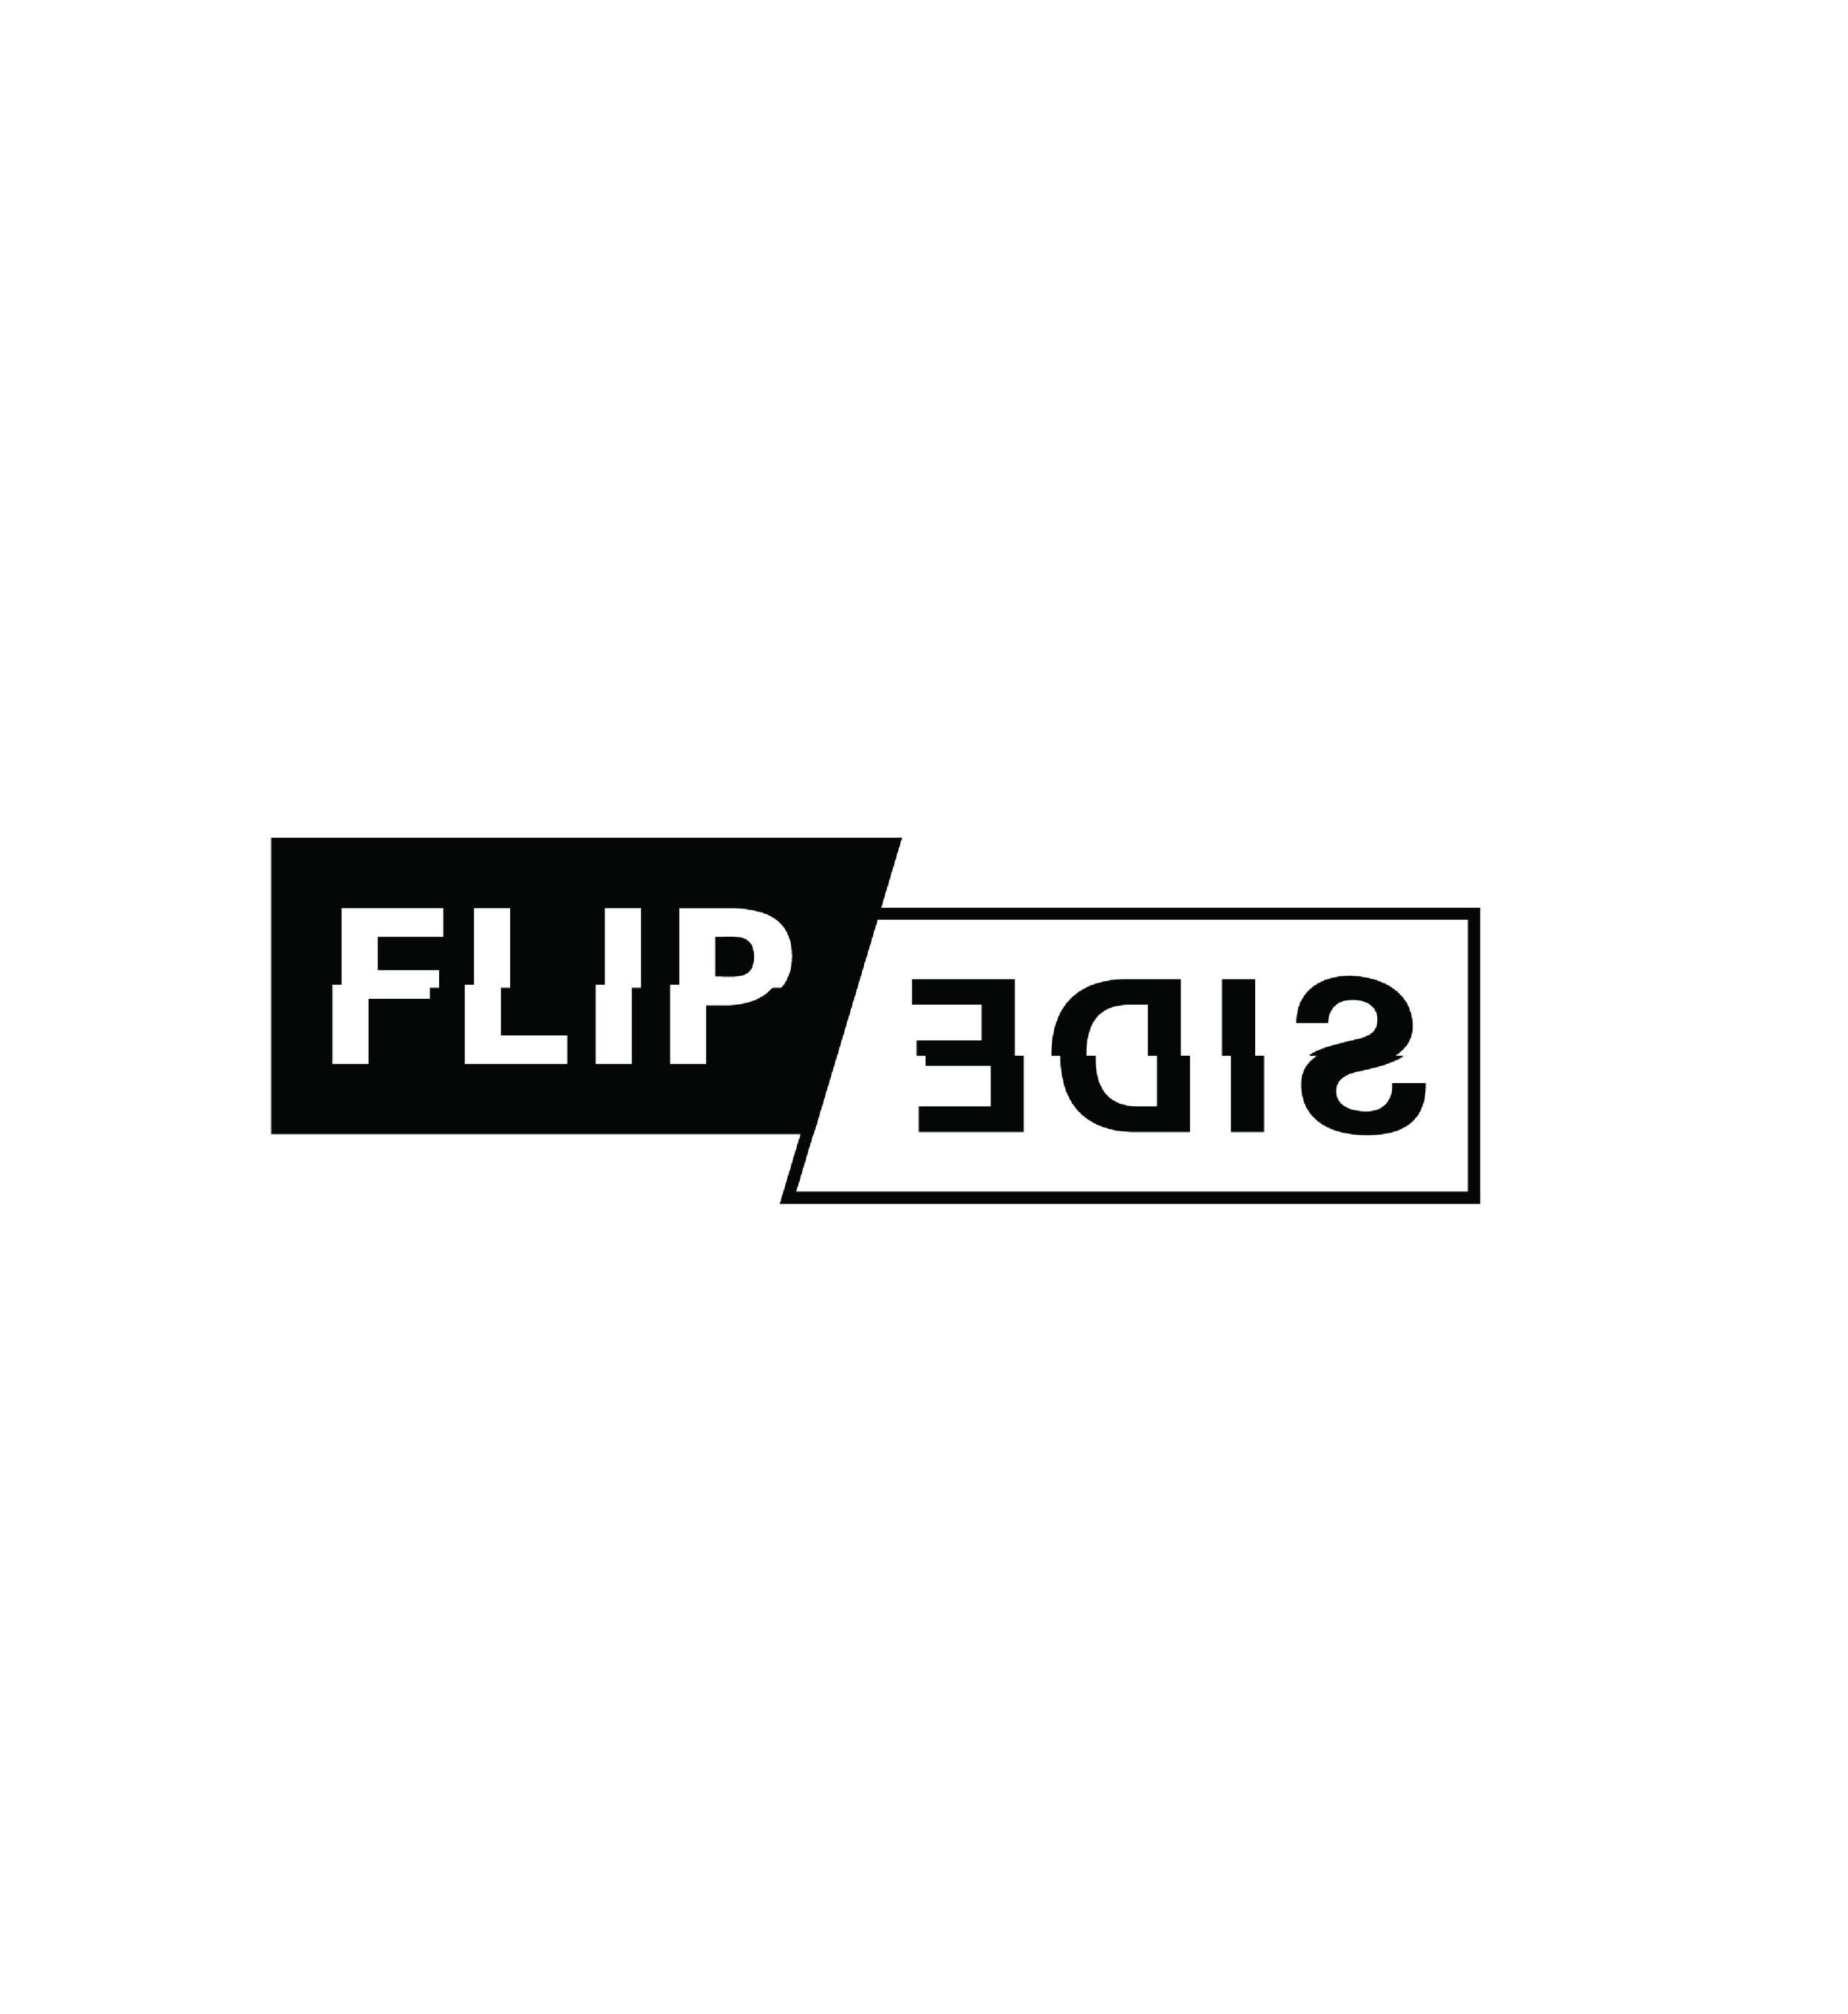 FlipSide-22.jpg